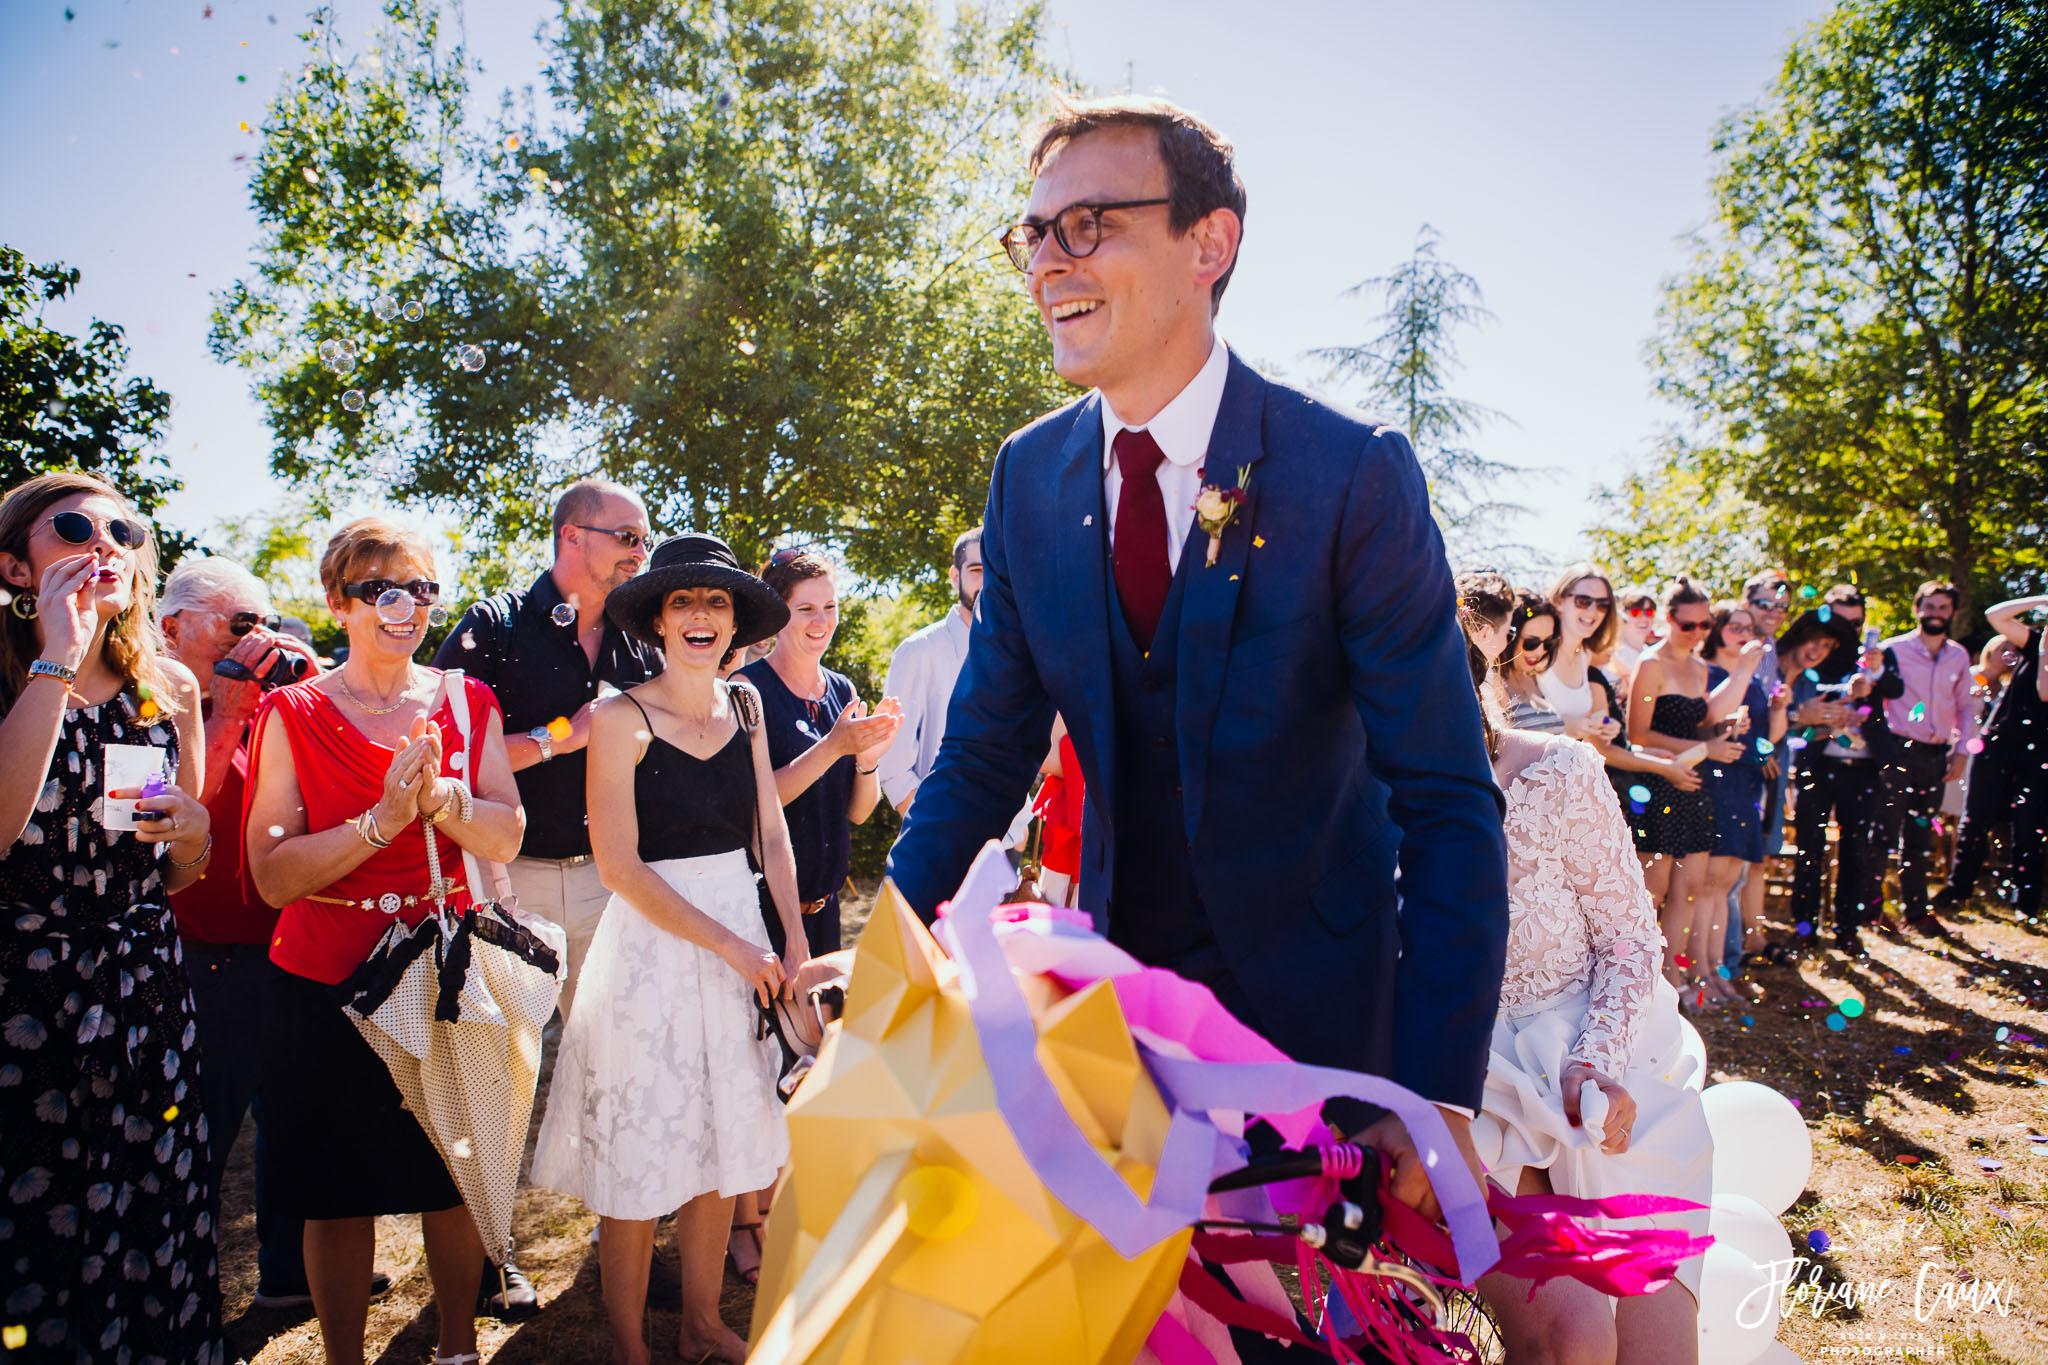 mariage-festival-cahors-ceremonie-laique-velo-licorne-10